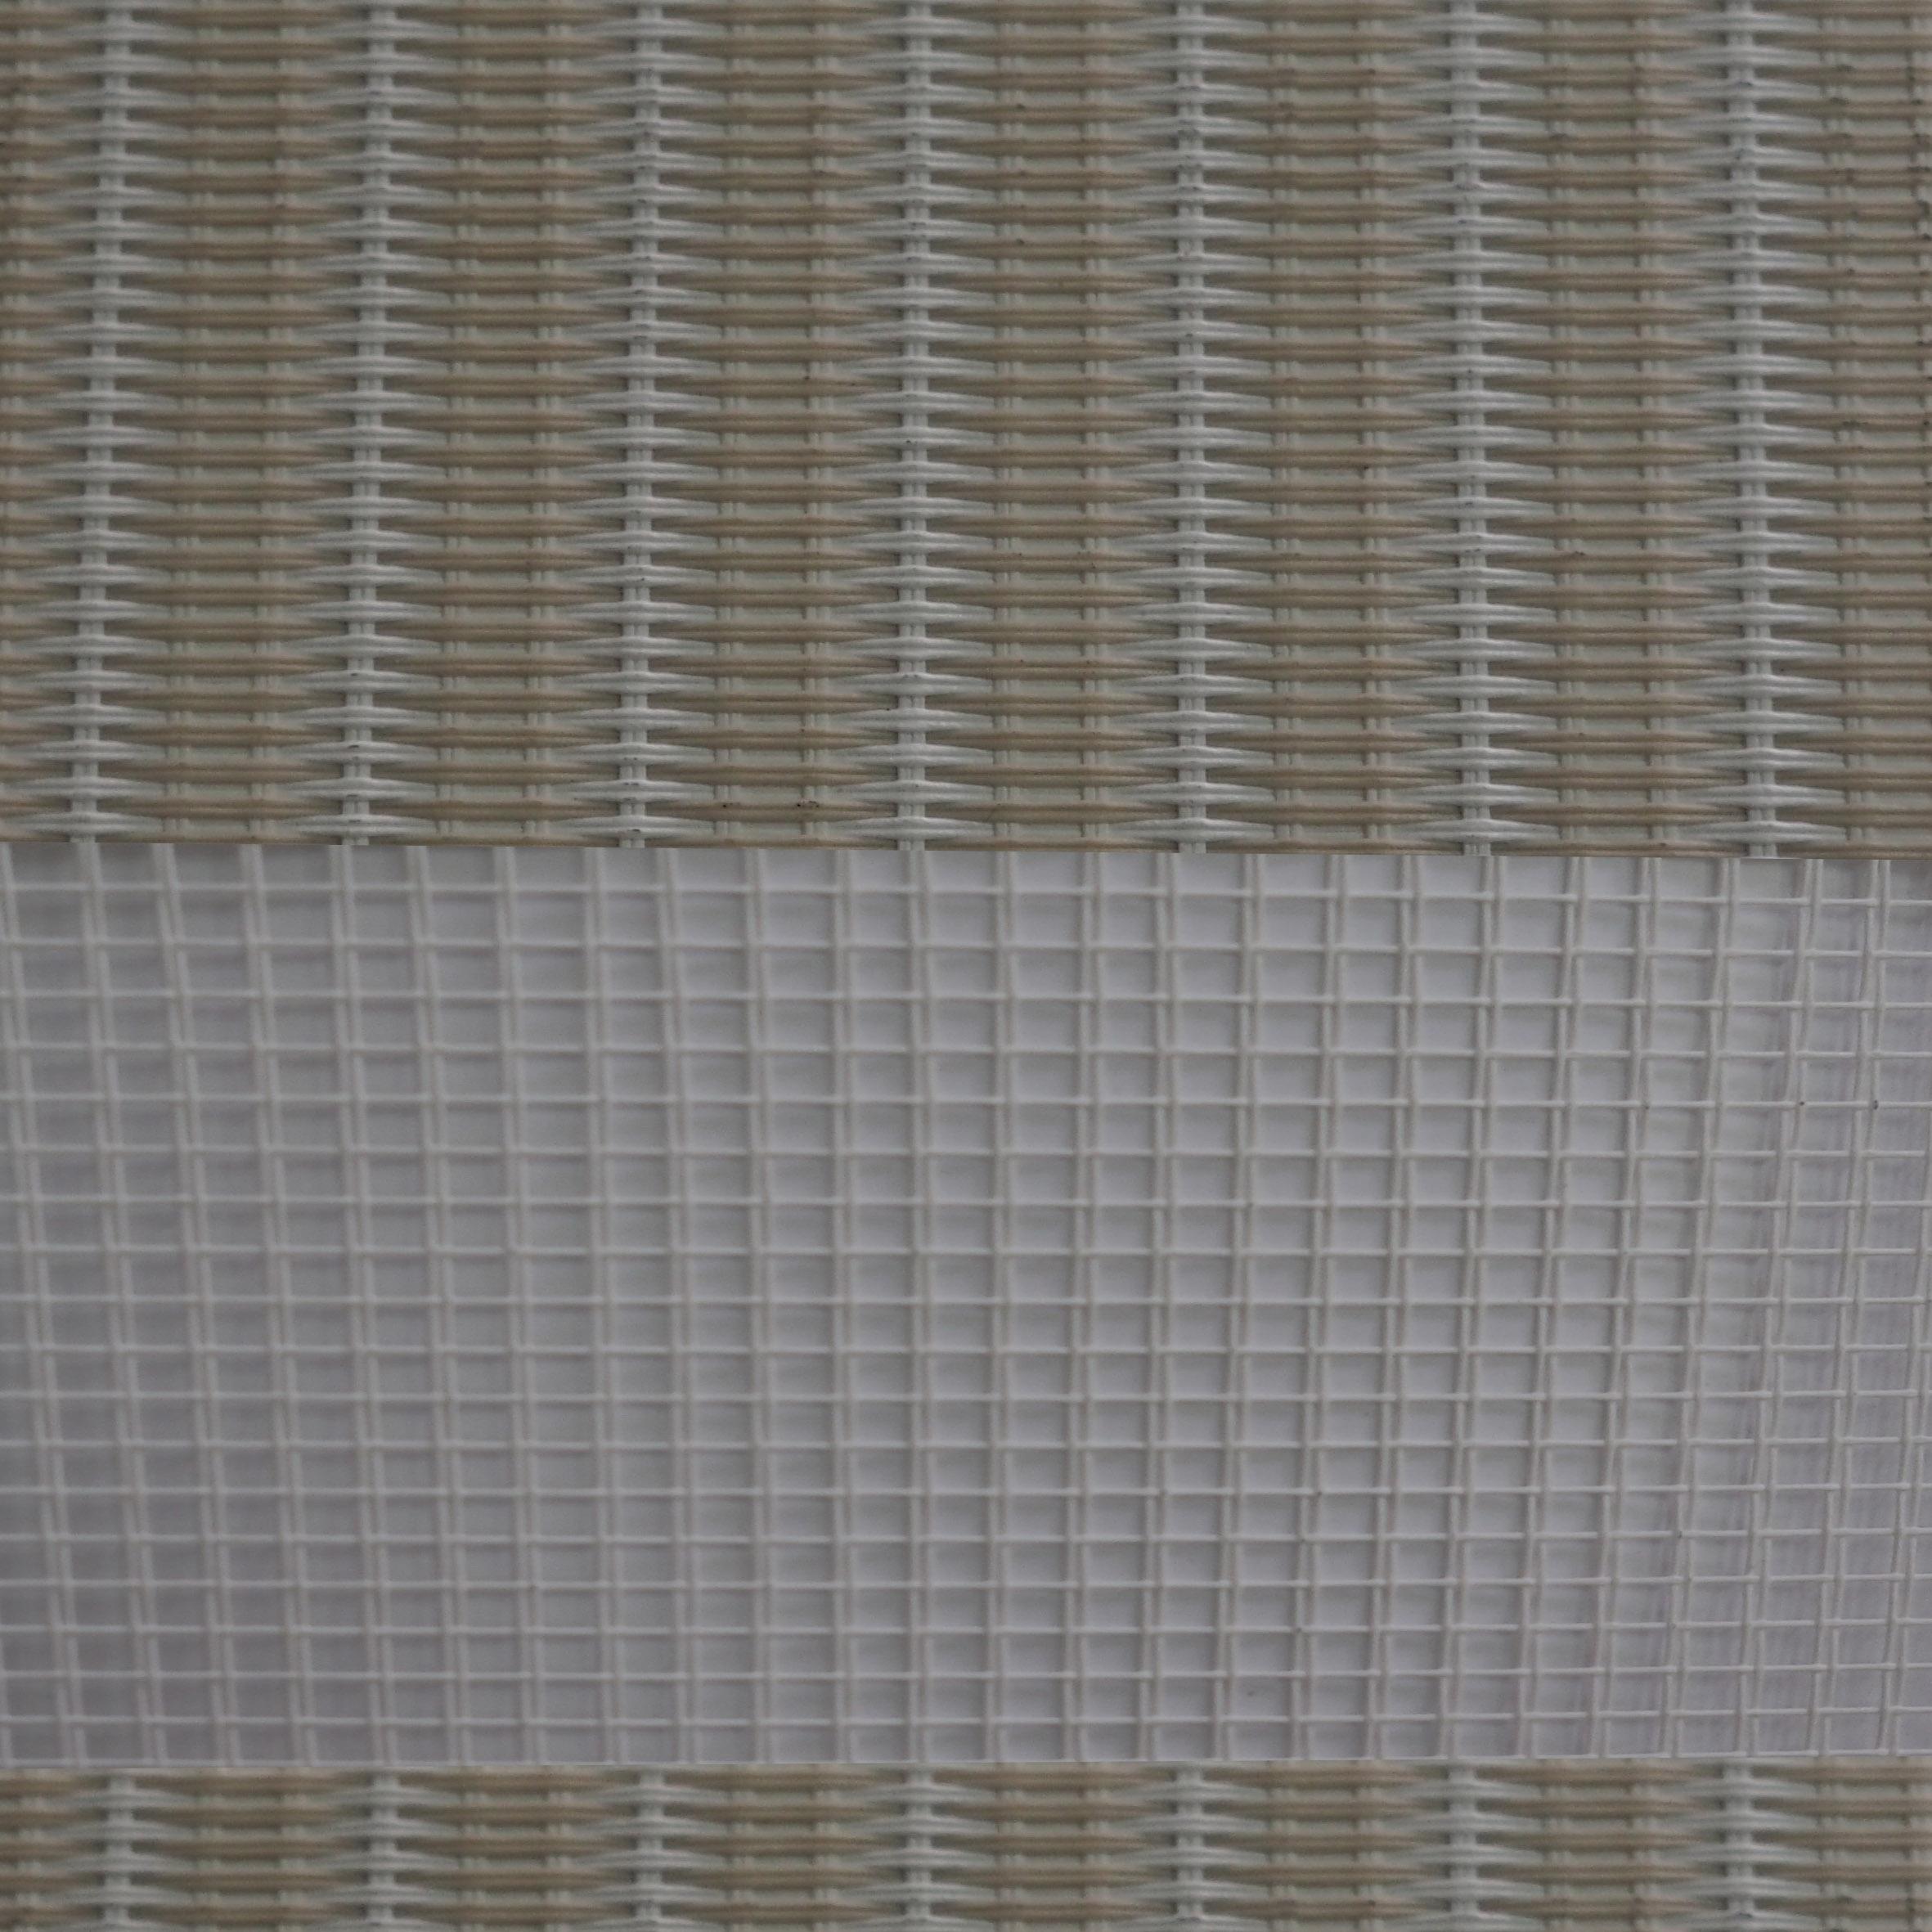 LO3002 White/lvory